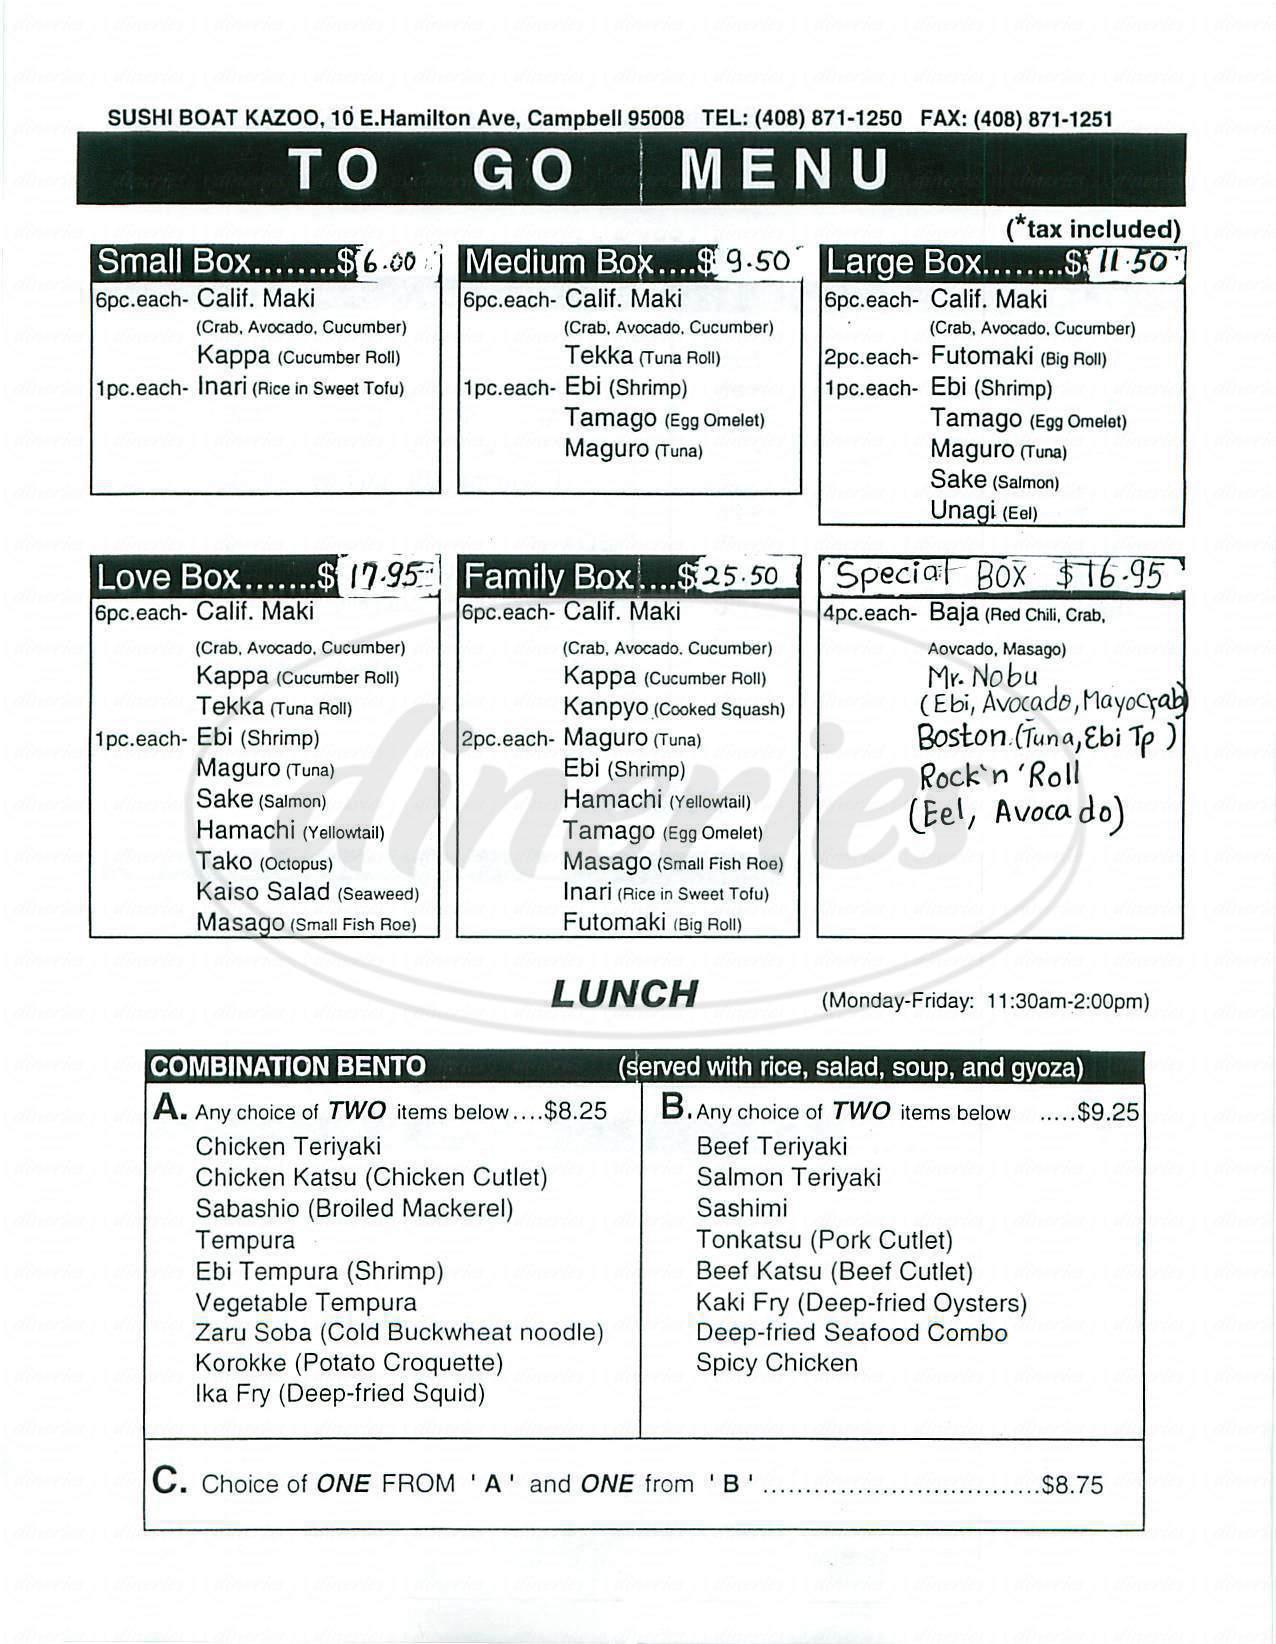 menu for Sushi Boat Kazoo